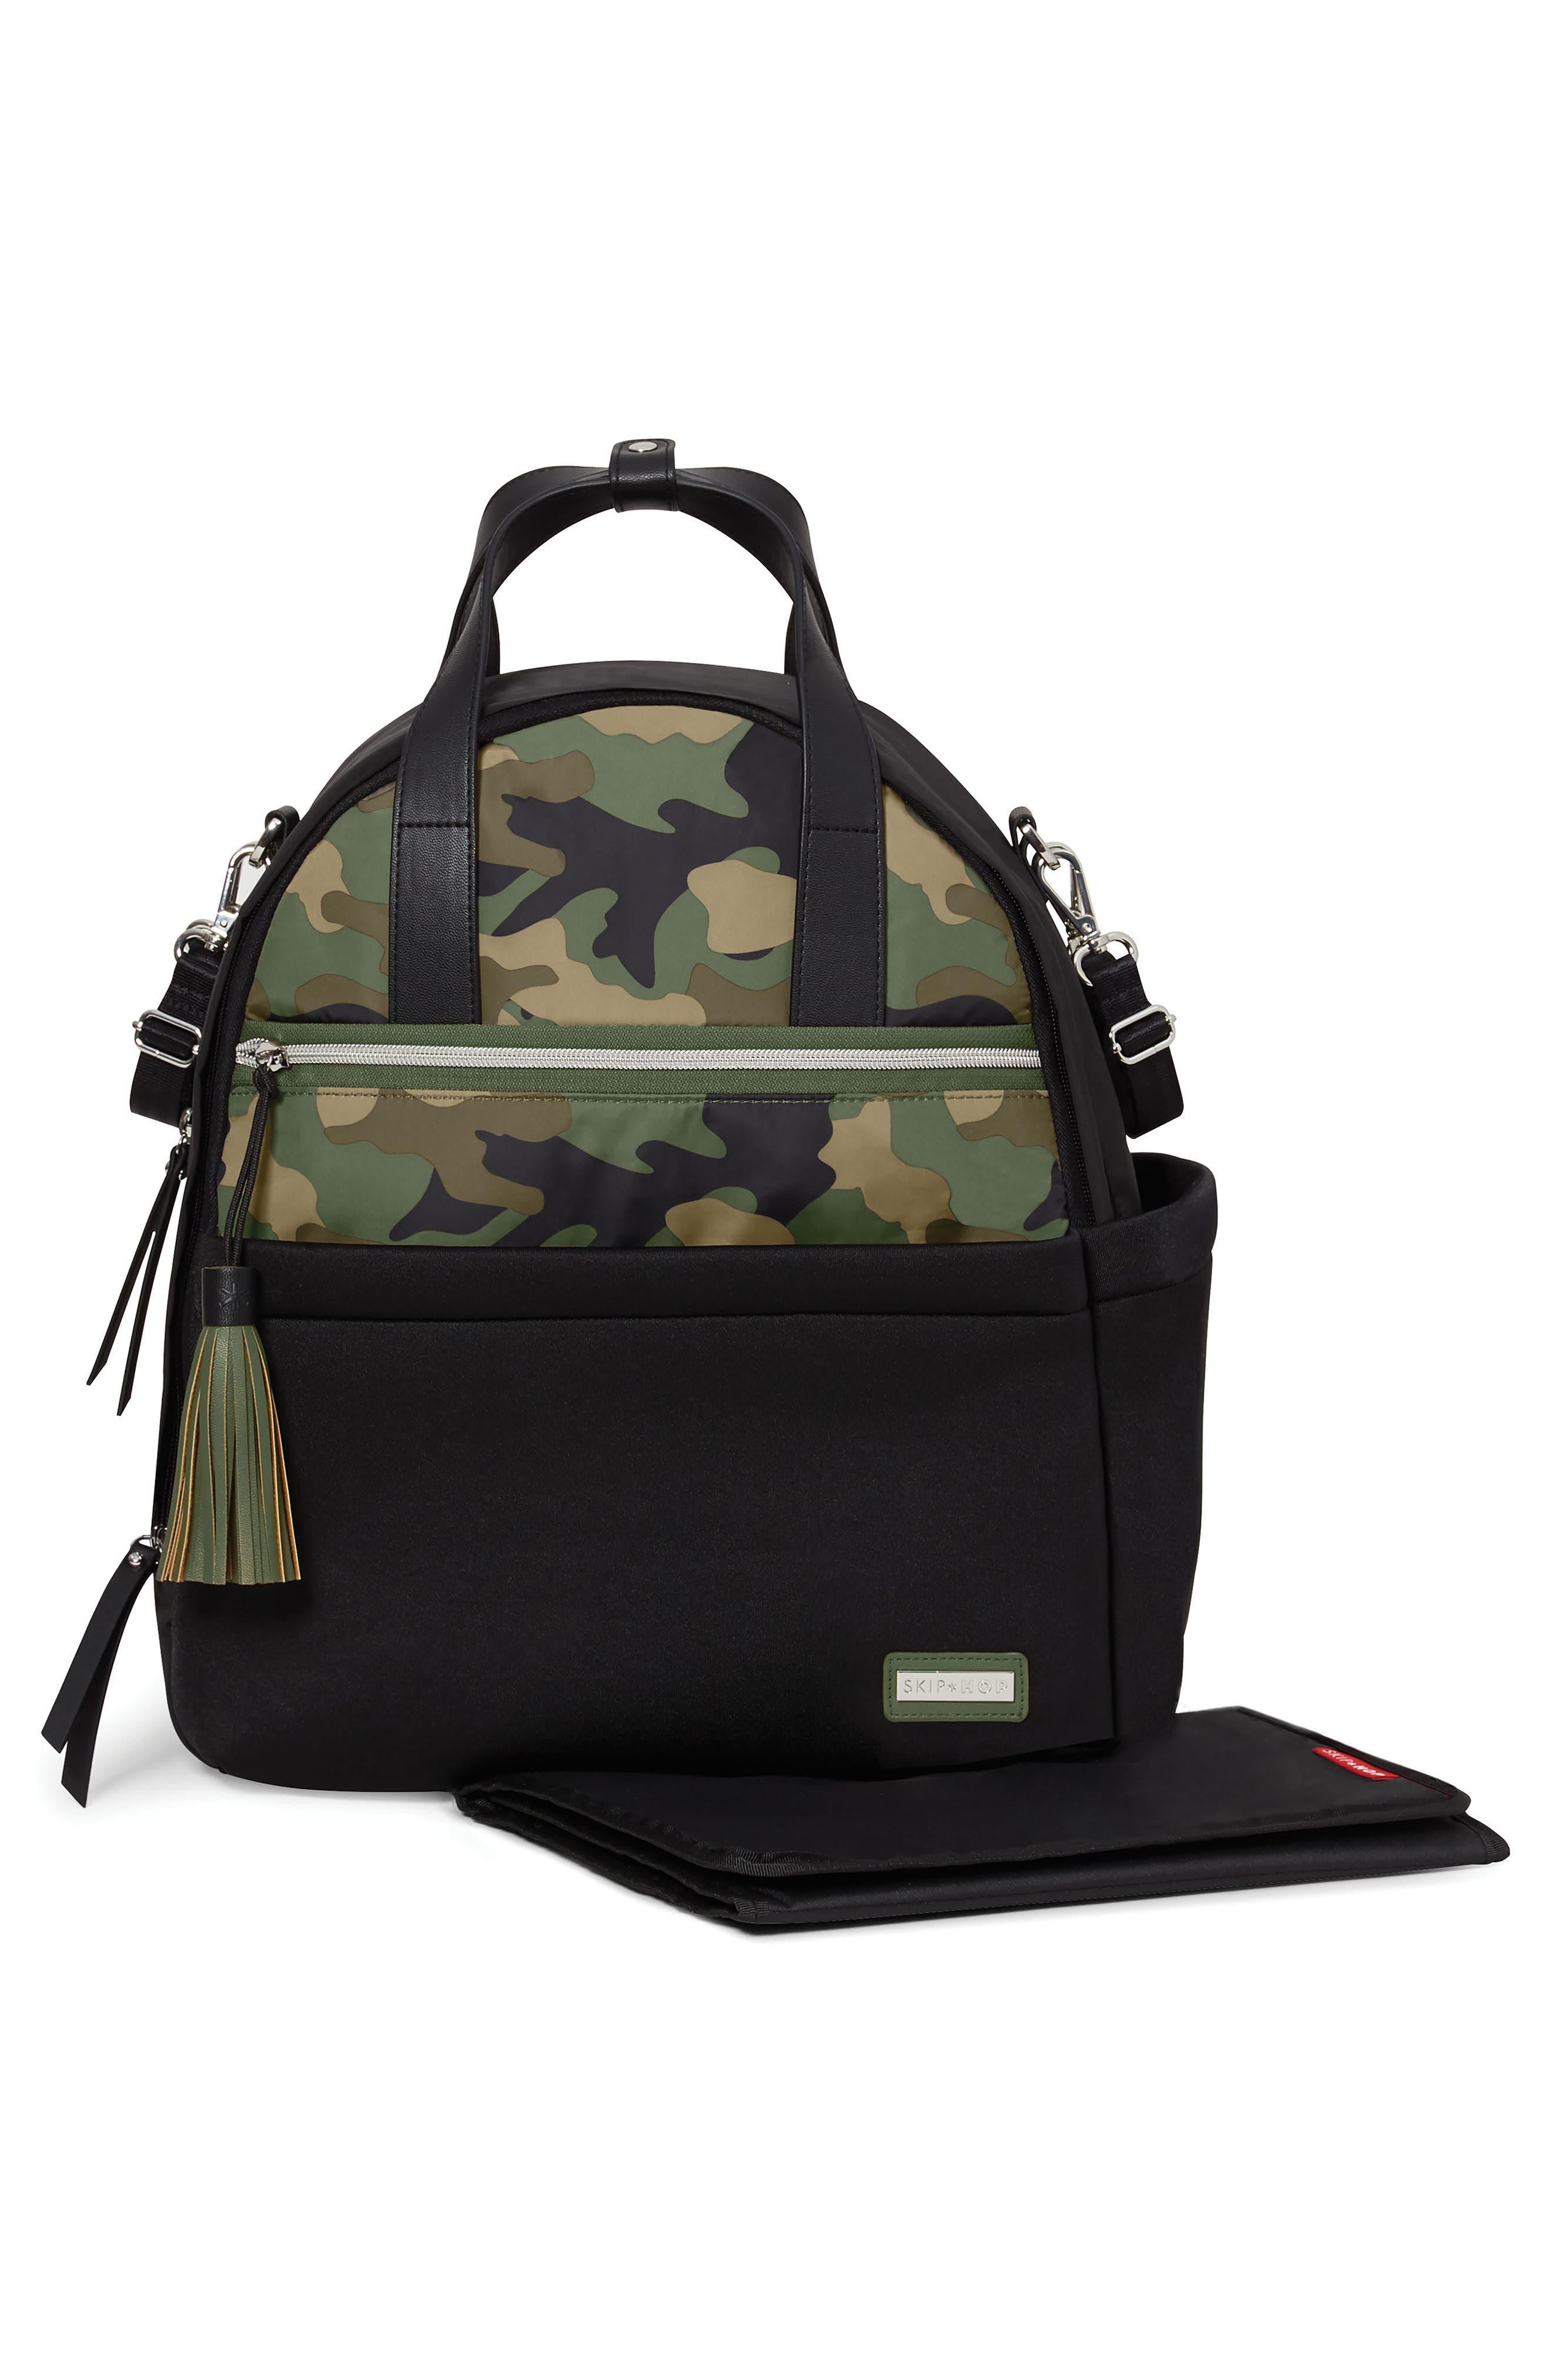 Nolita Neoprene Diaper Backpack,                             Alternate thumbnail 2, color,                             BLACK/ DARK CAMO